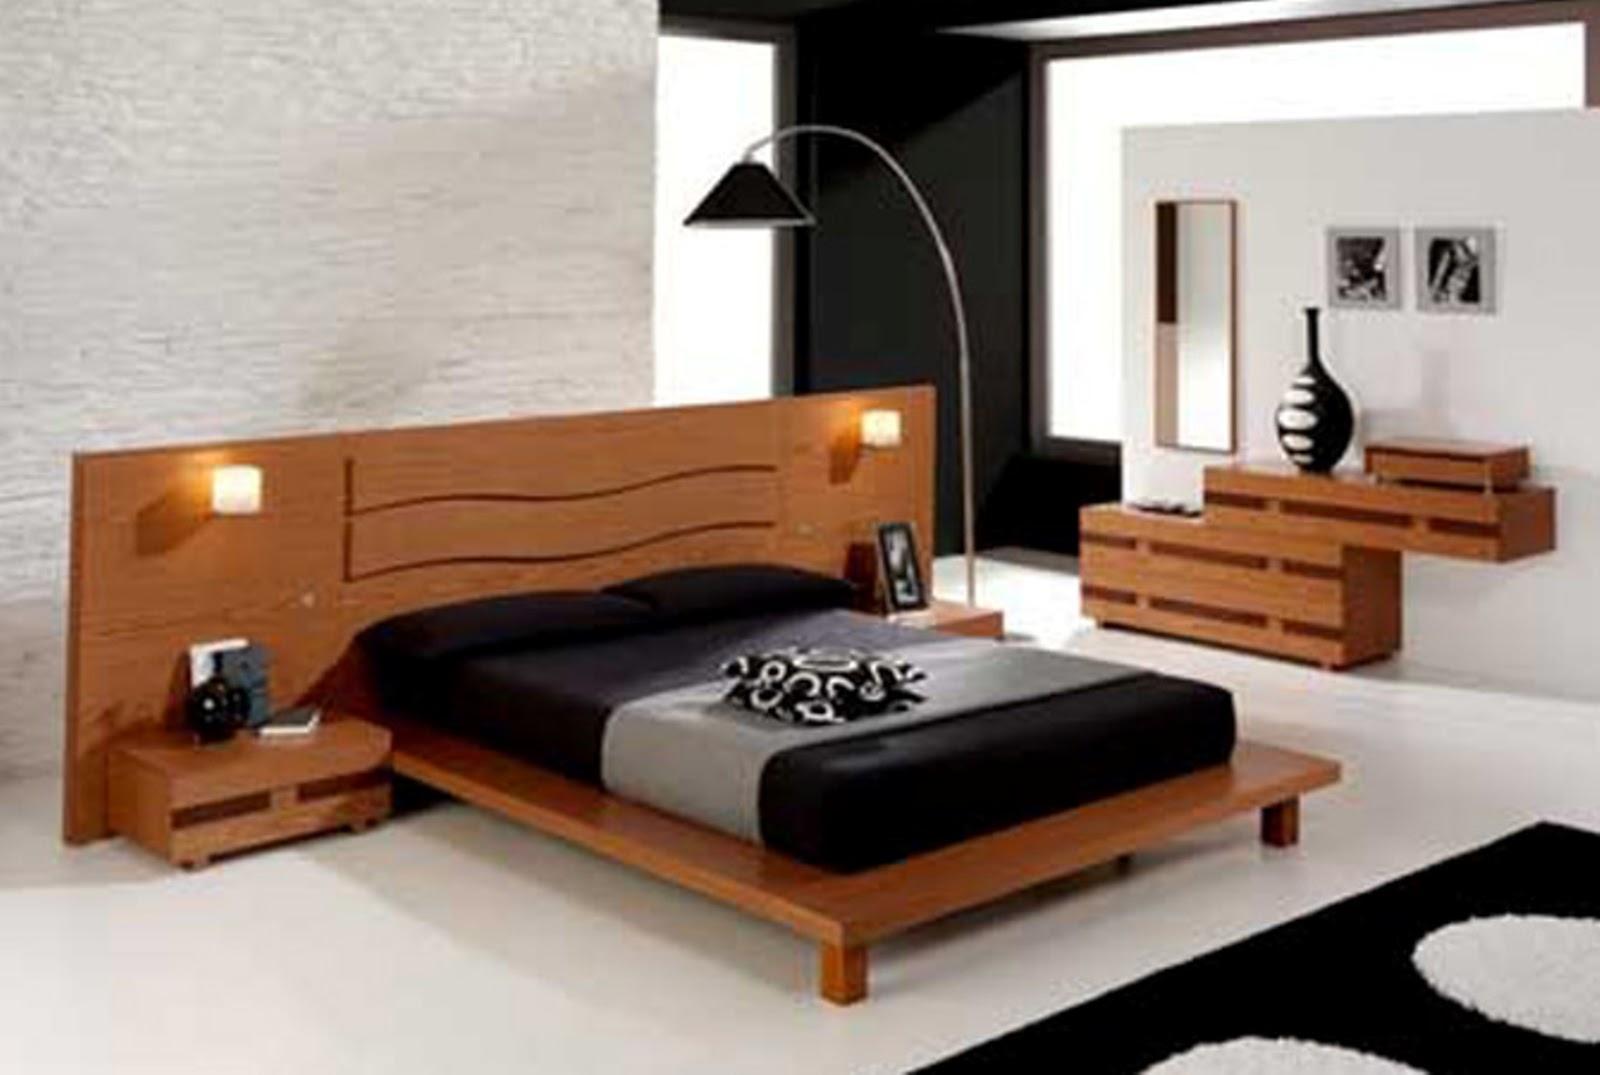 catalogue s works 2015 autos post. Black Bedroom Furniture Sets. Home Design Ideas